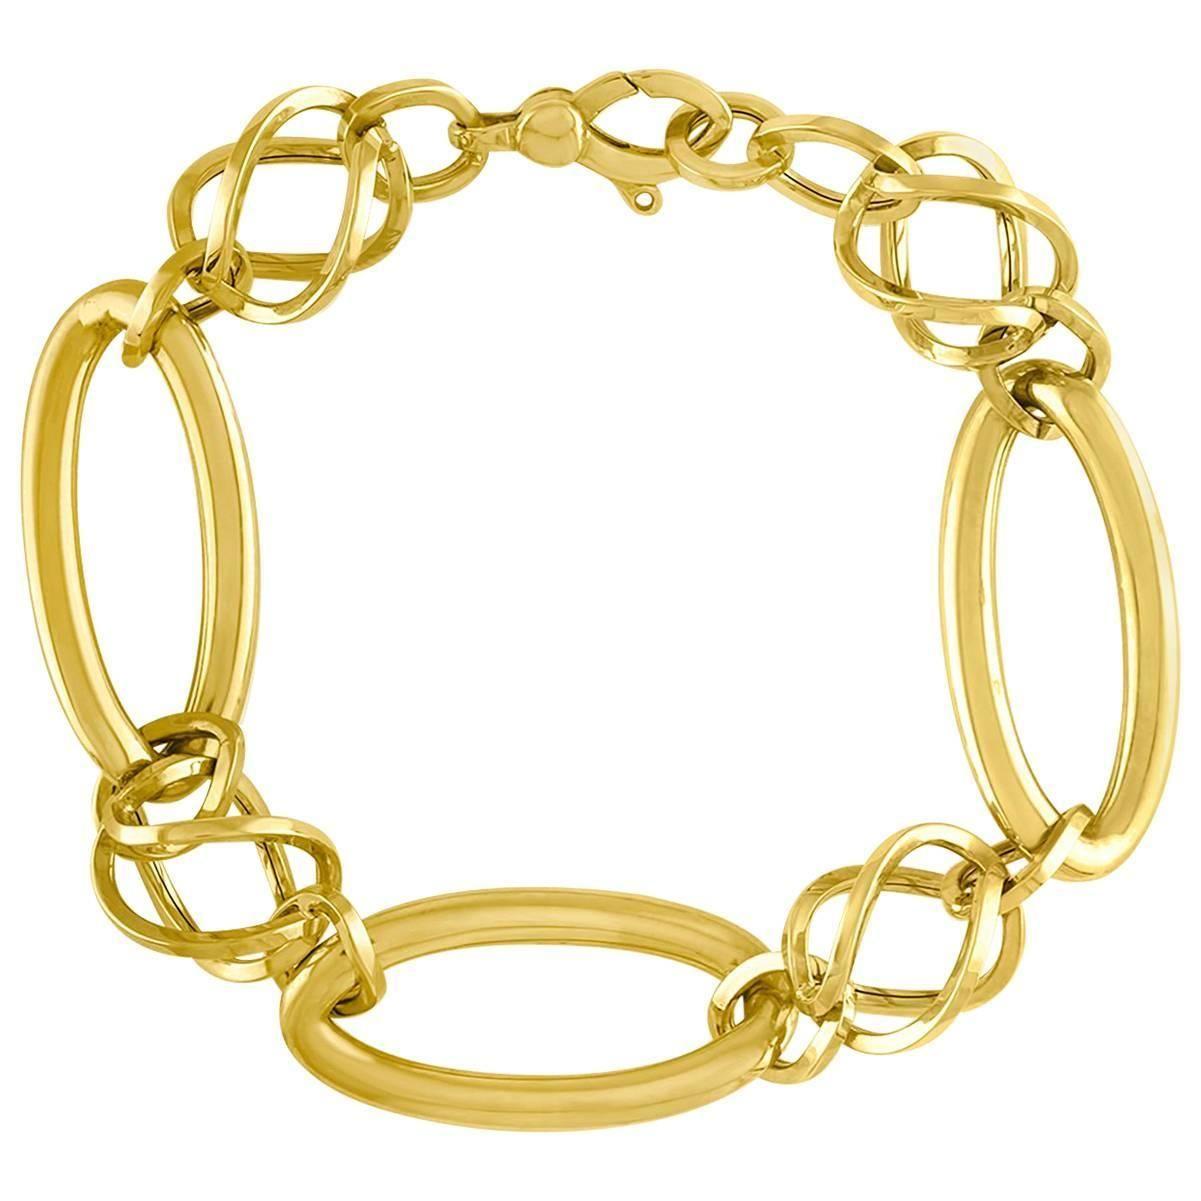 2de5b740531 Golden Clef International Italy Gold Link Bracelet in 2019 | My ...